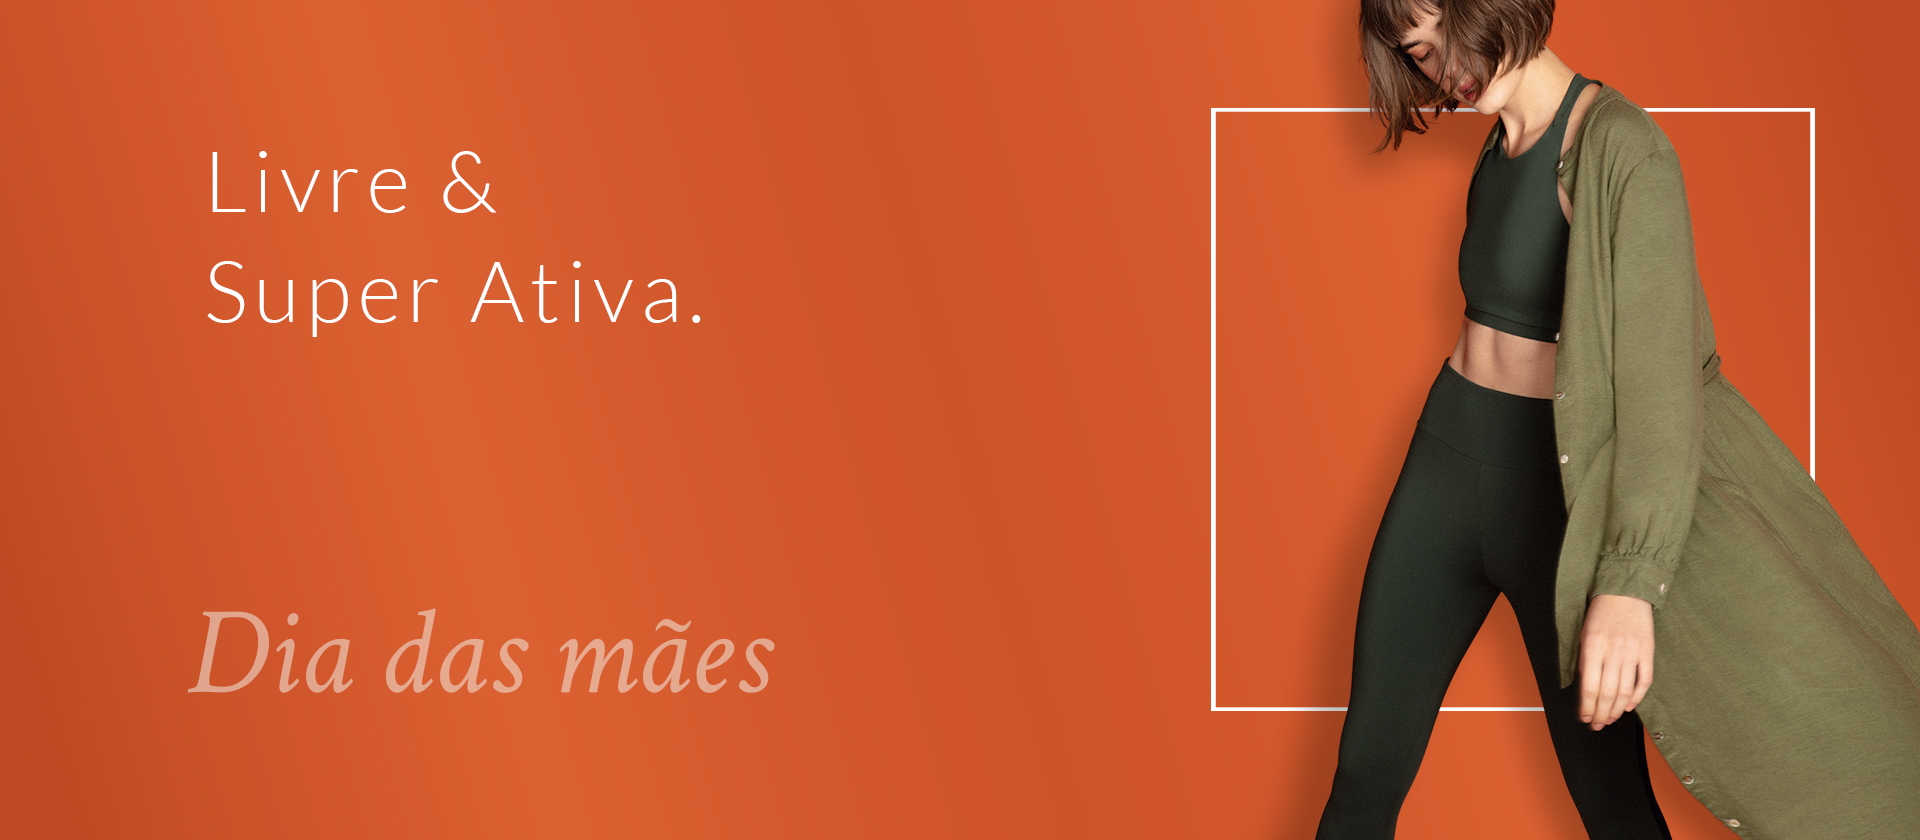 Maes_LivreAtiva